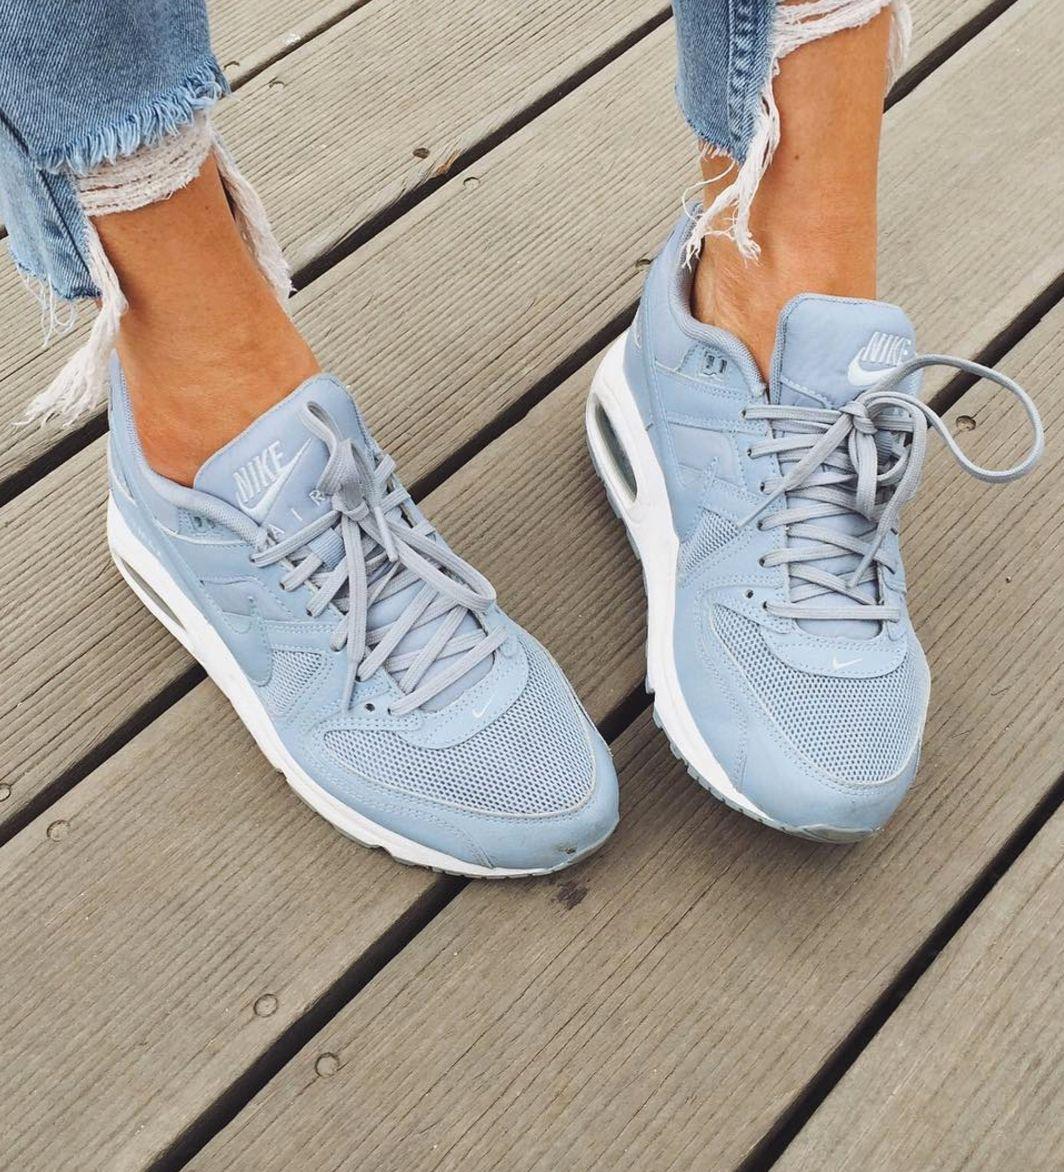 aefbae04519 pinterest   sydharrisx ☆ perriwinkle blue nike trainers